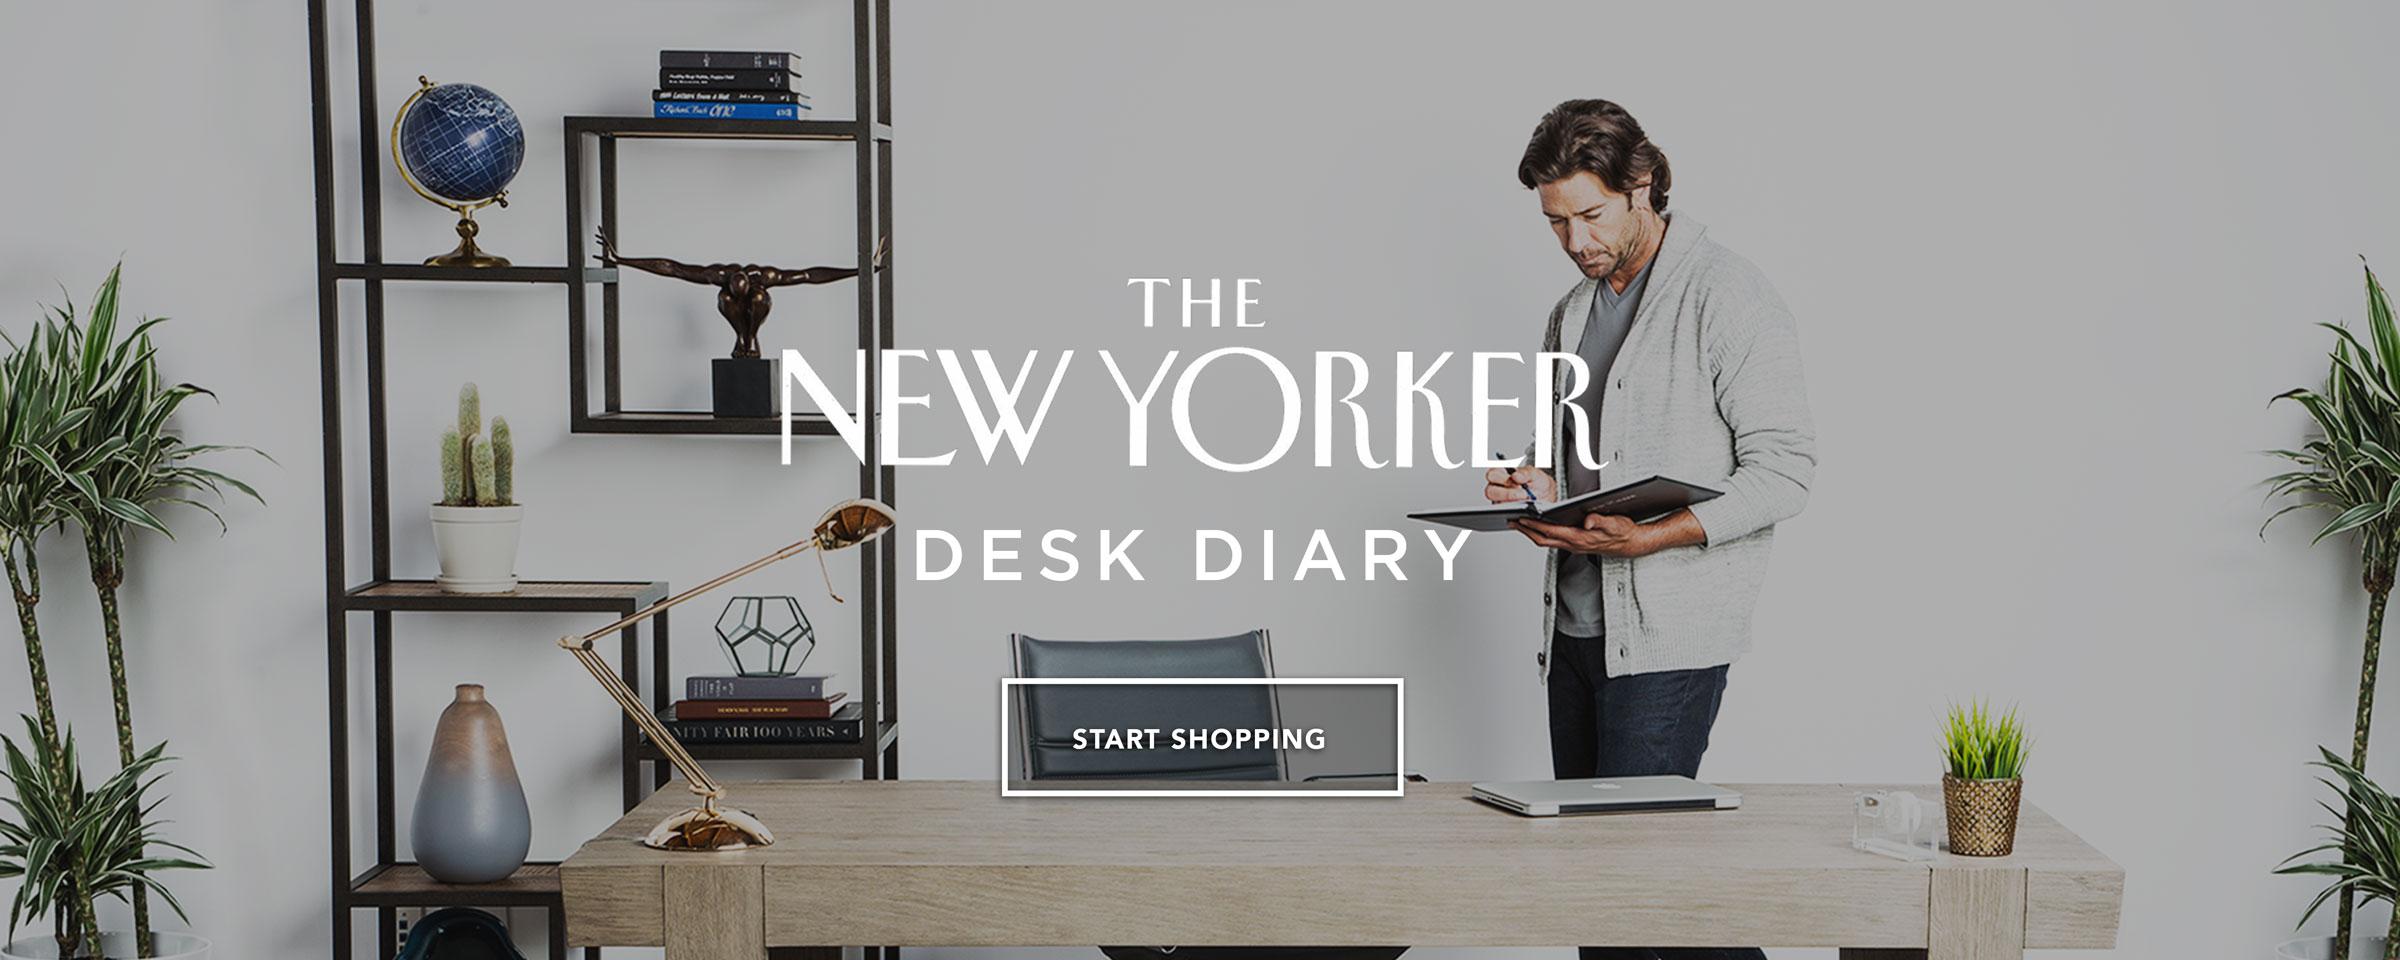 New Yorker Desk Diary Day Planner 2018